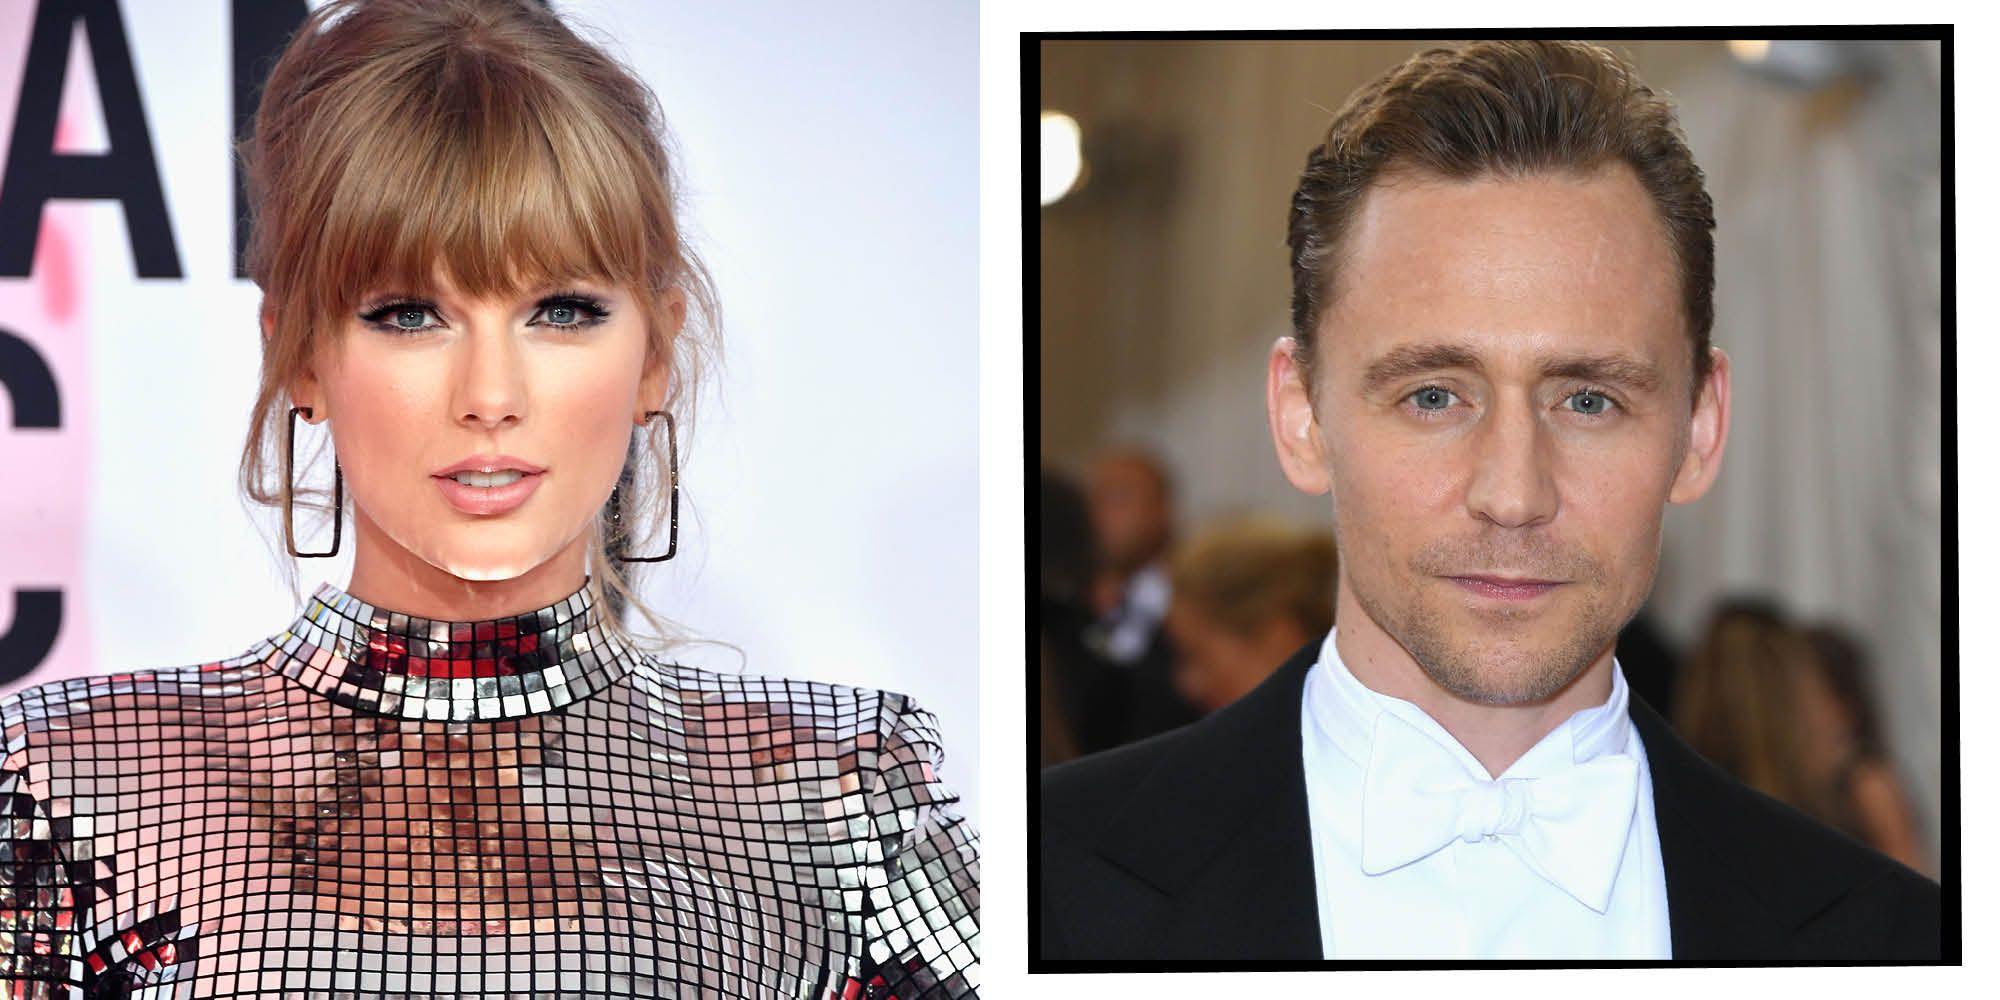 Tom hiddleston and natalie portman dating